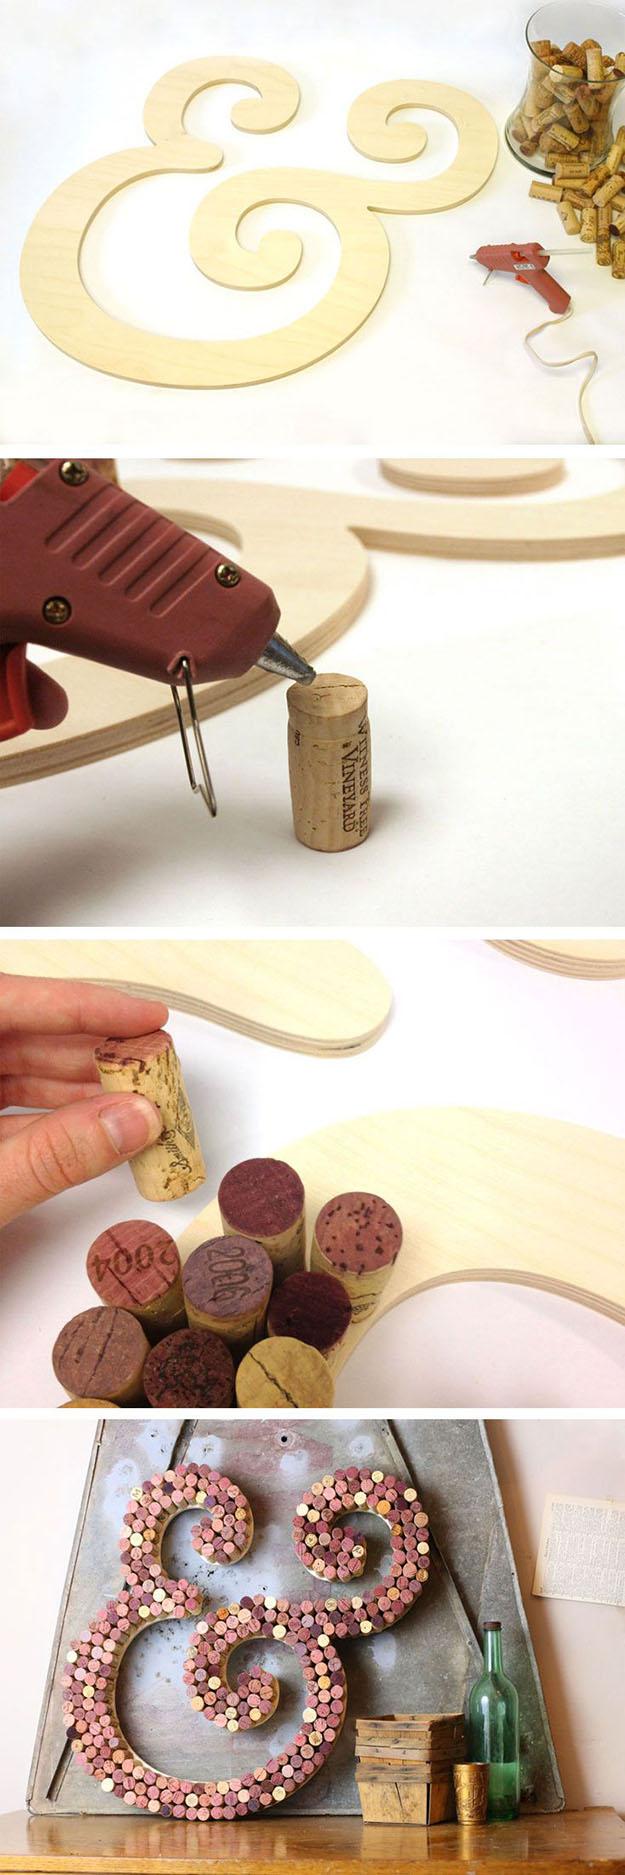 Easy Wine Cork DIY Wall Decor Projects